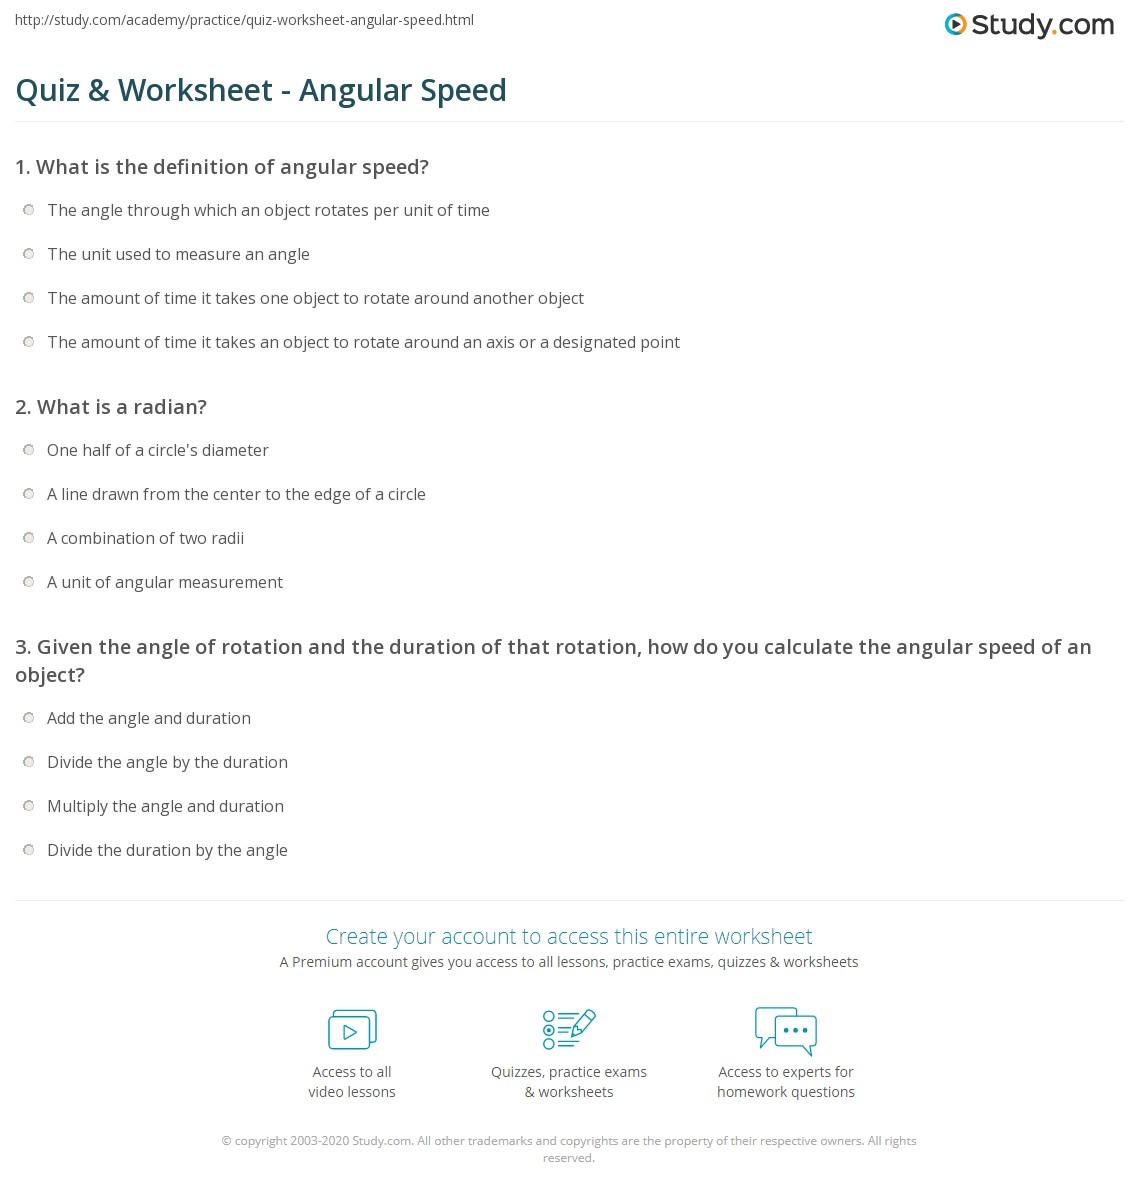 Quiz & Worksheet - Angular Speed   Study.com